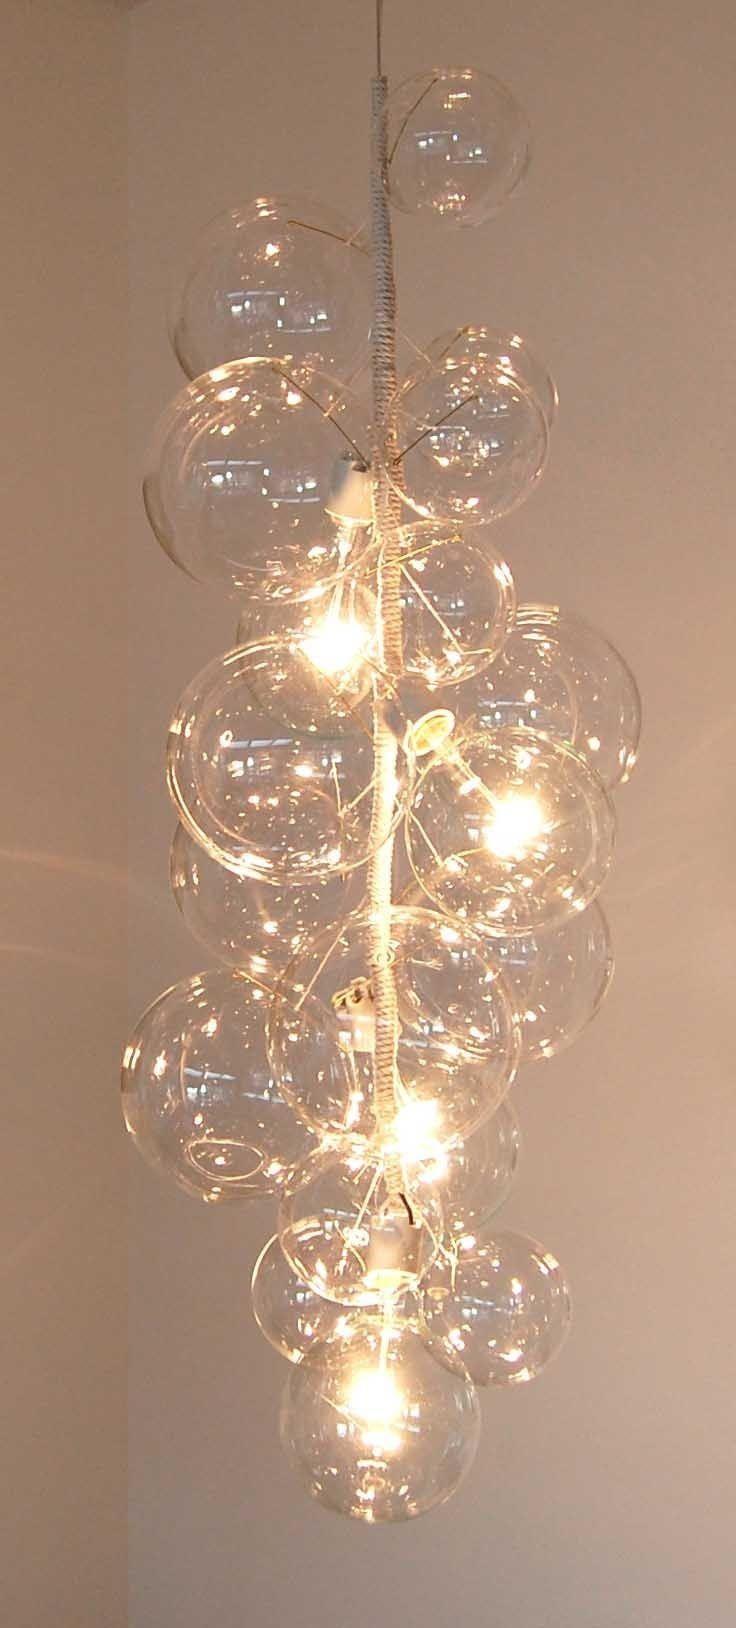 bubble glass chandelier by solaria. bubble glass chandelier by solaria  chandeliers  pinterest